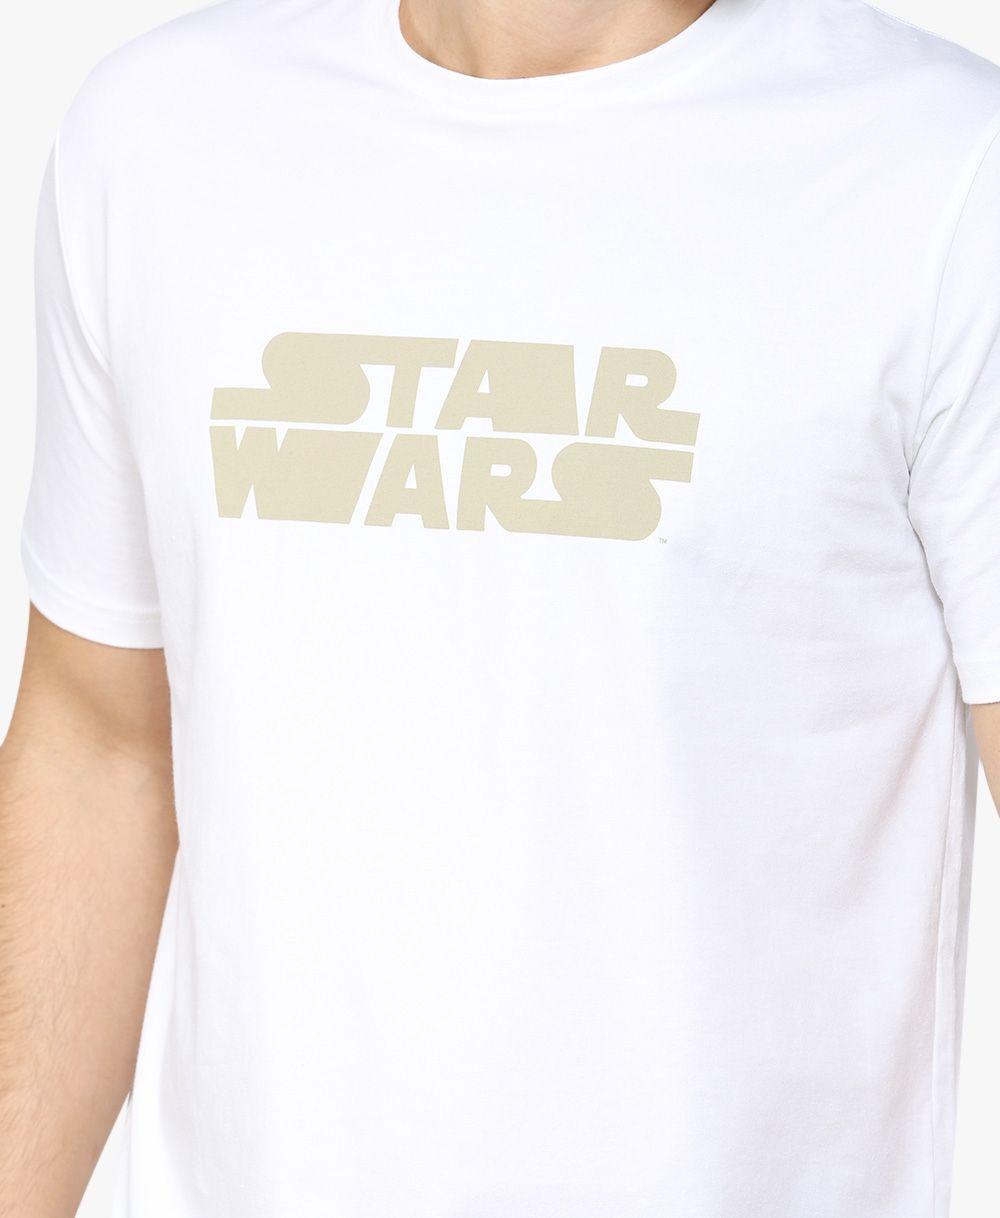 8a91653a848 White MFO Star Wars Training T-shirt   White MFO Star Wars Training ...